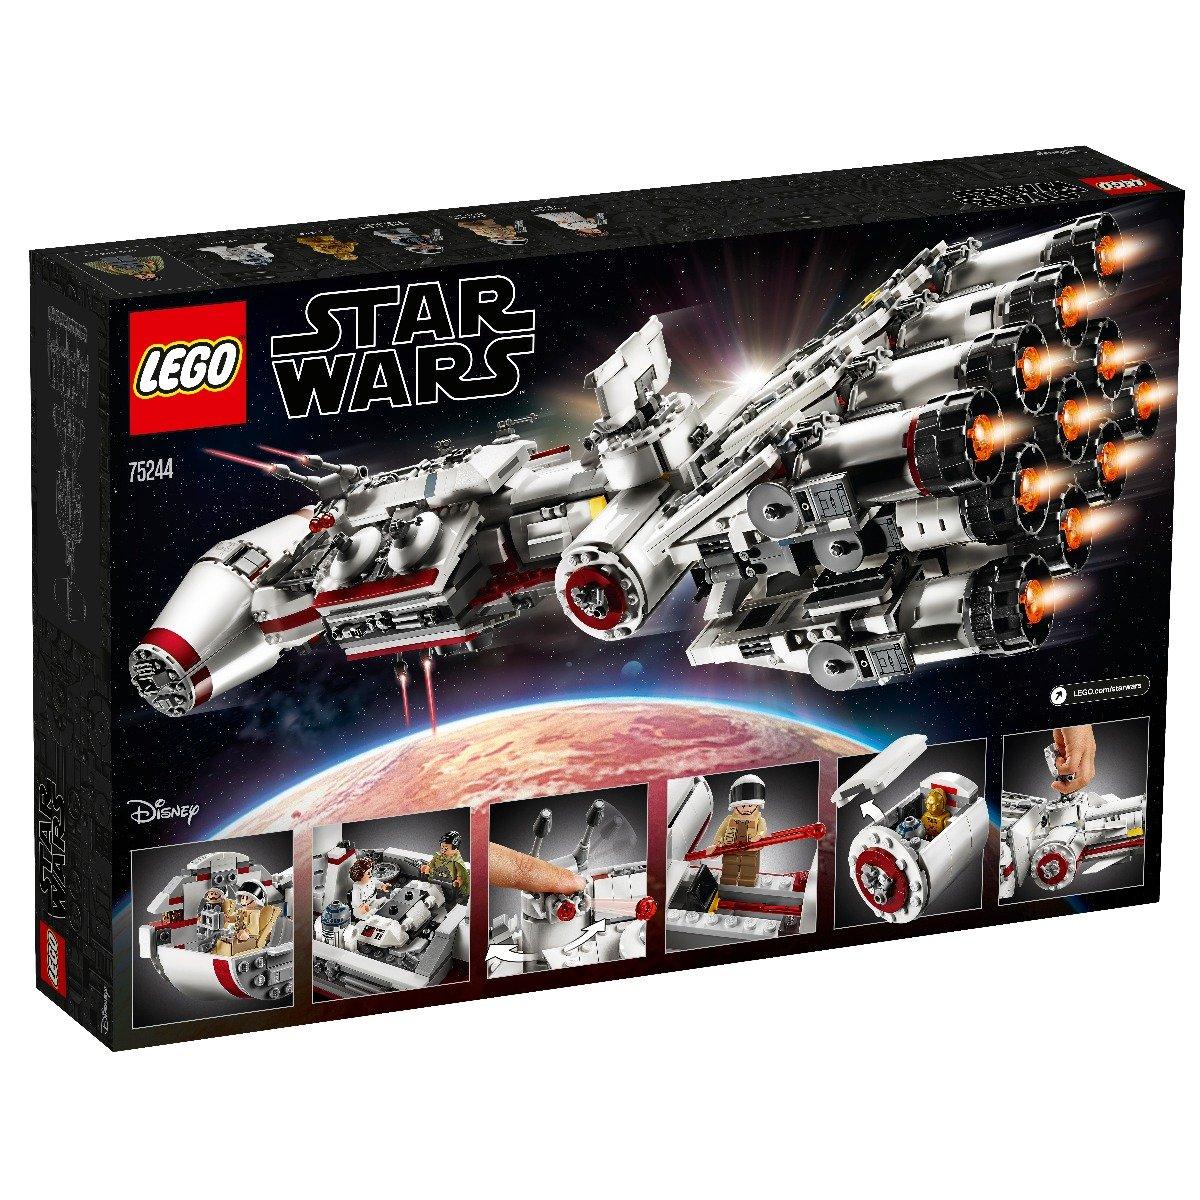 LEGO® Star Wars™ – Tantive IV (75244)